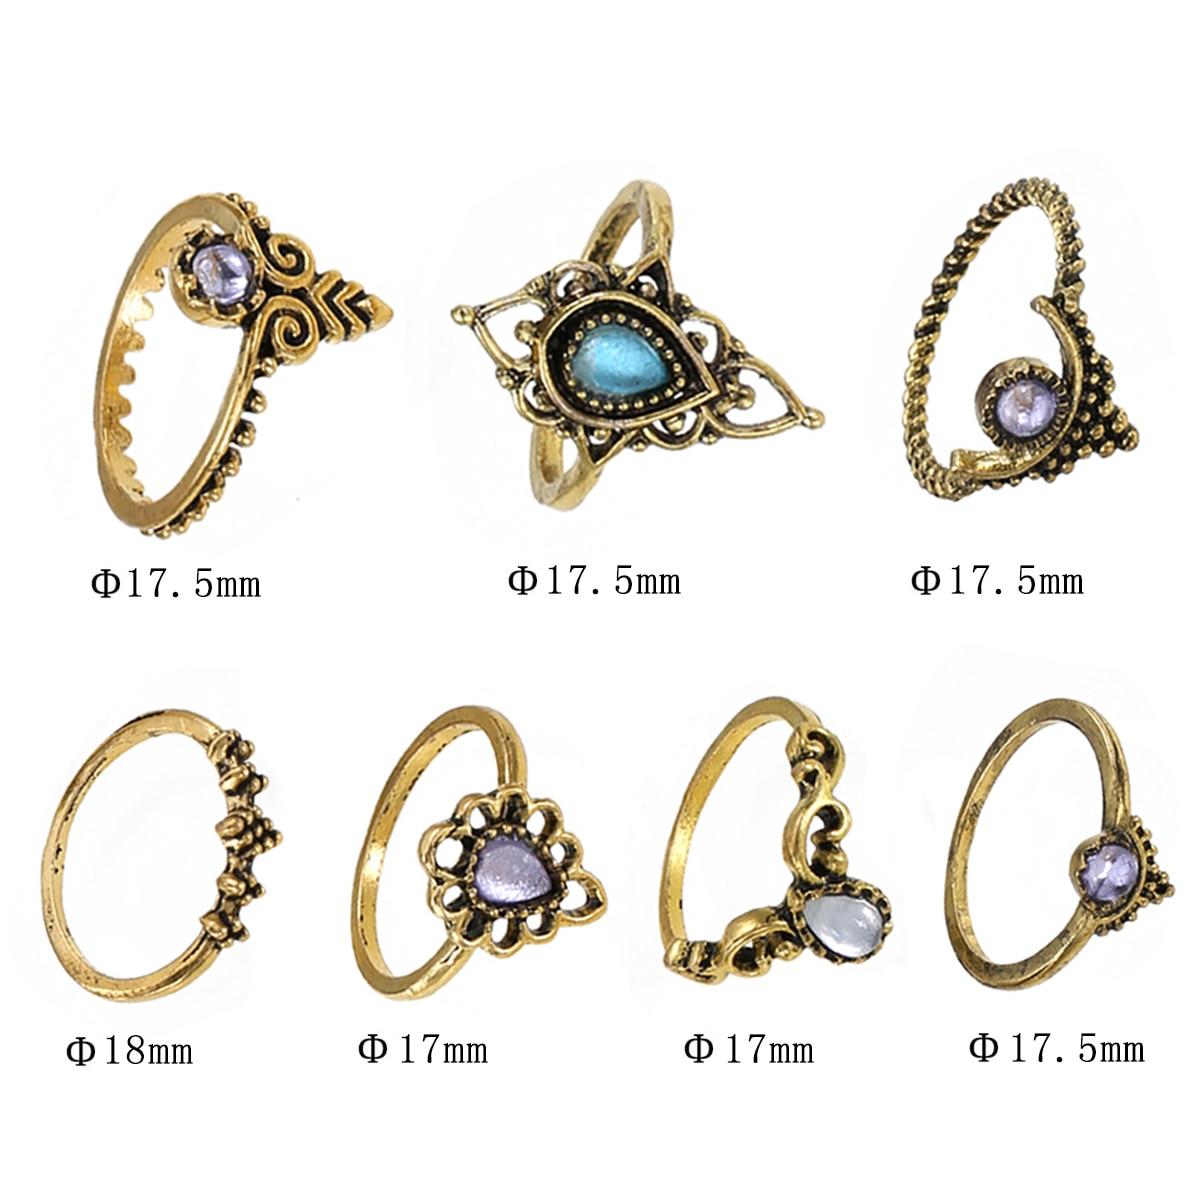 7pcs/set Vintage Boho Rings Shellhard Purple Gemstone Midi Knuckle Ring Set For Women Female Bohemia Jewelry